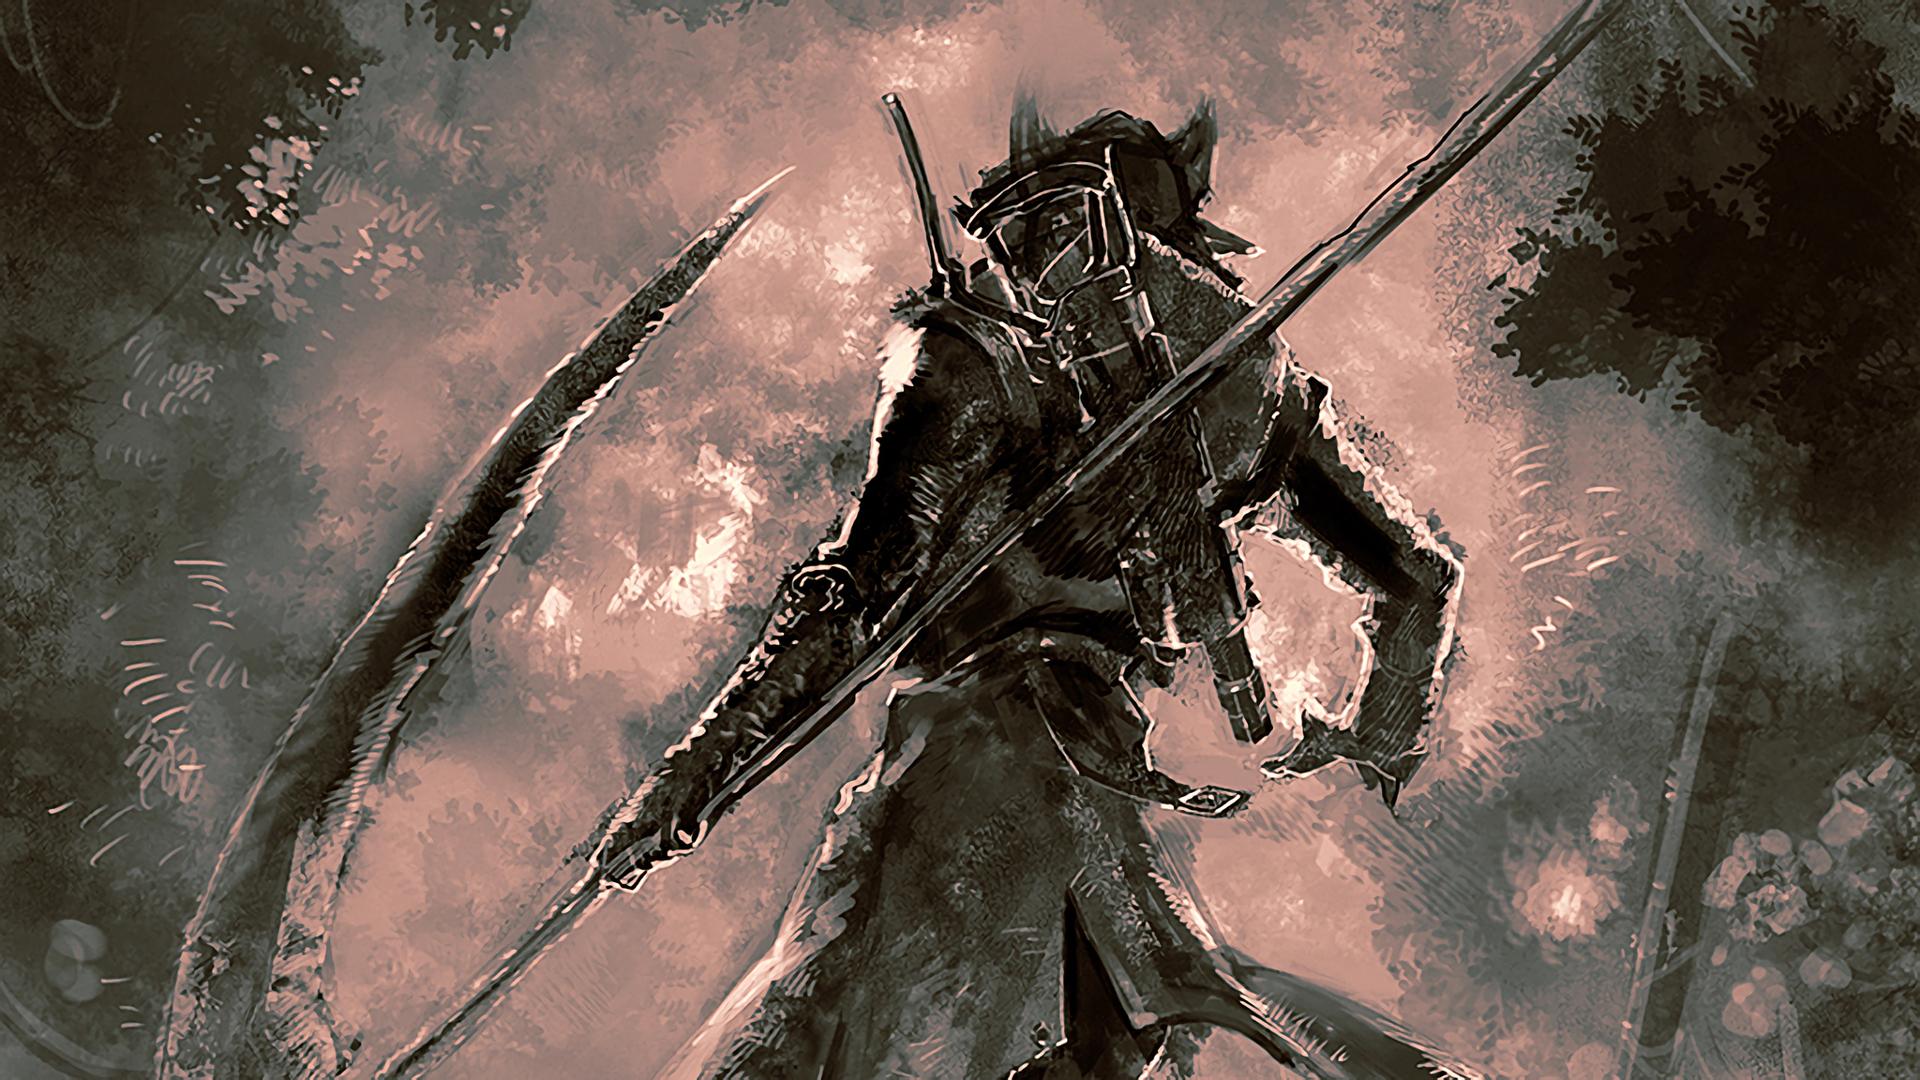 Bloodborne HD Wallpaper